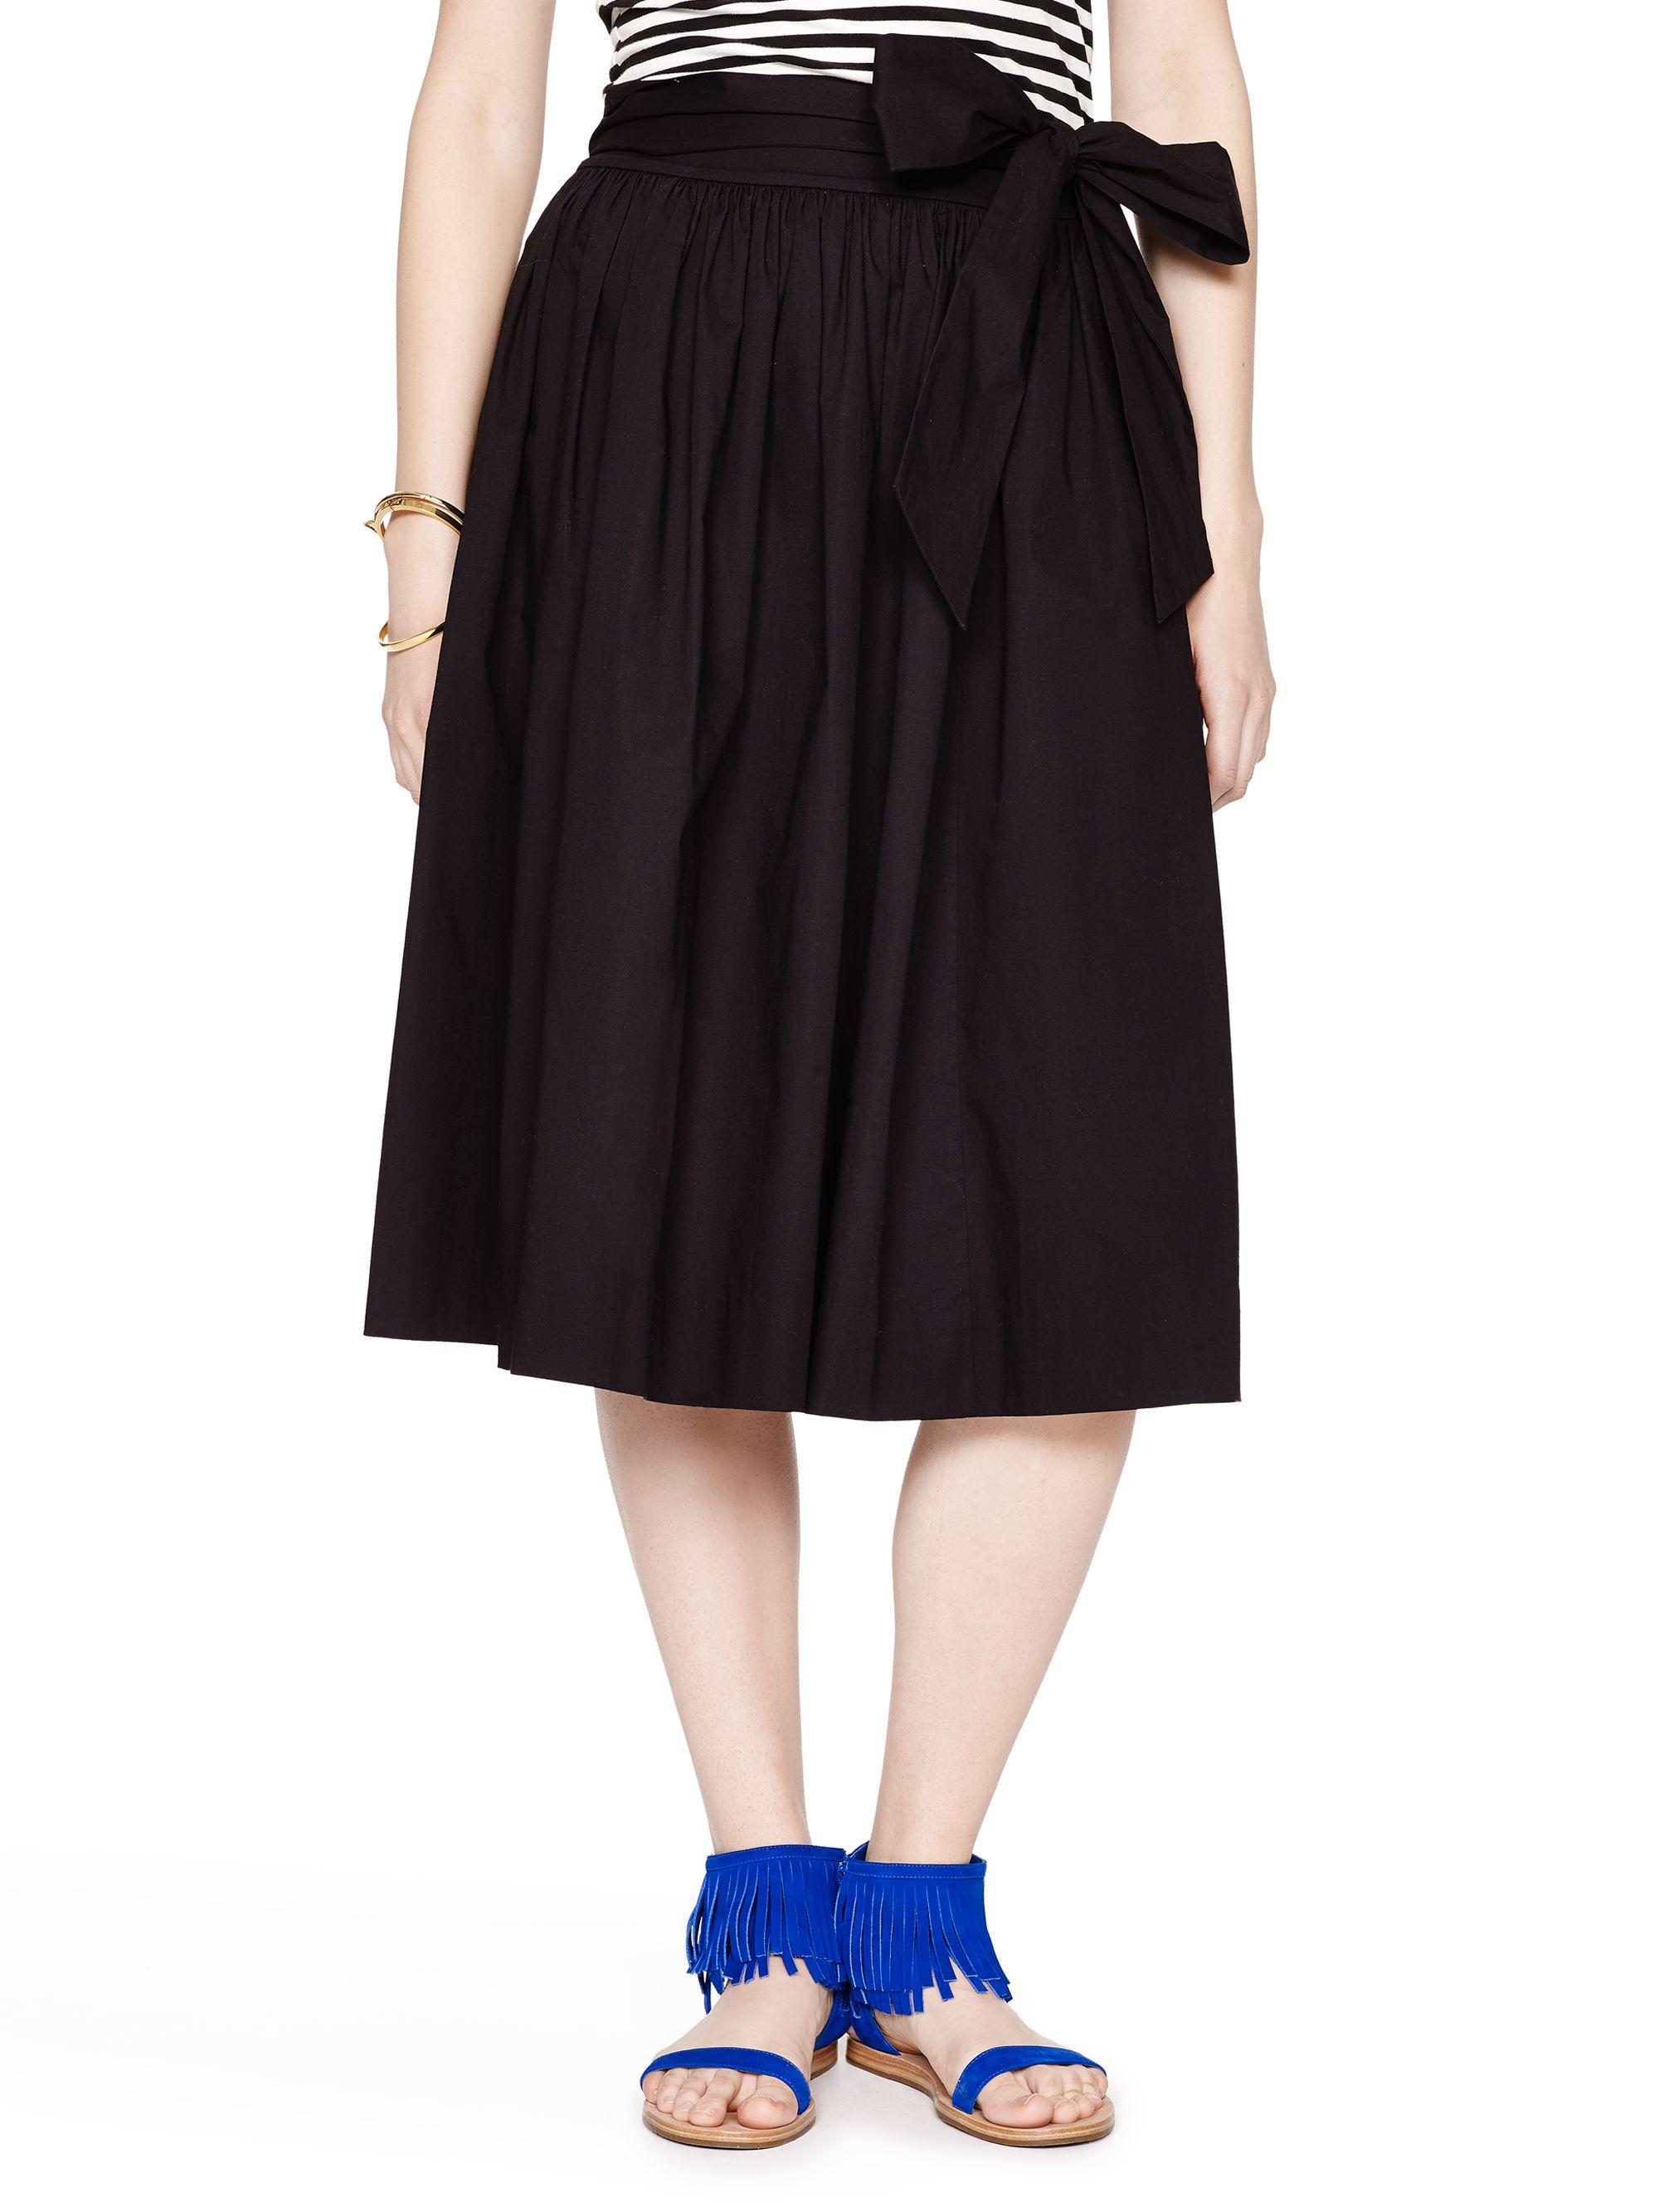 Black Tie Skirts